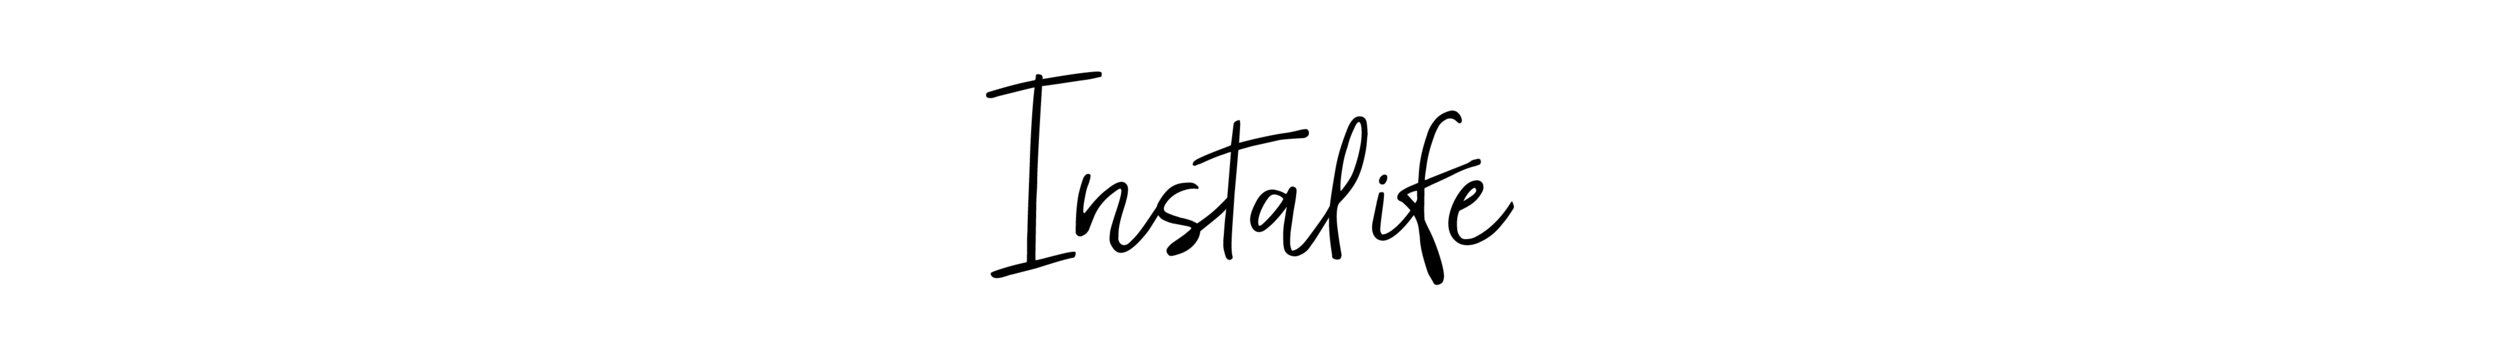 KA_Web Title_Instalife-03.png